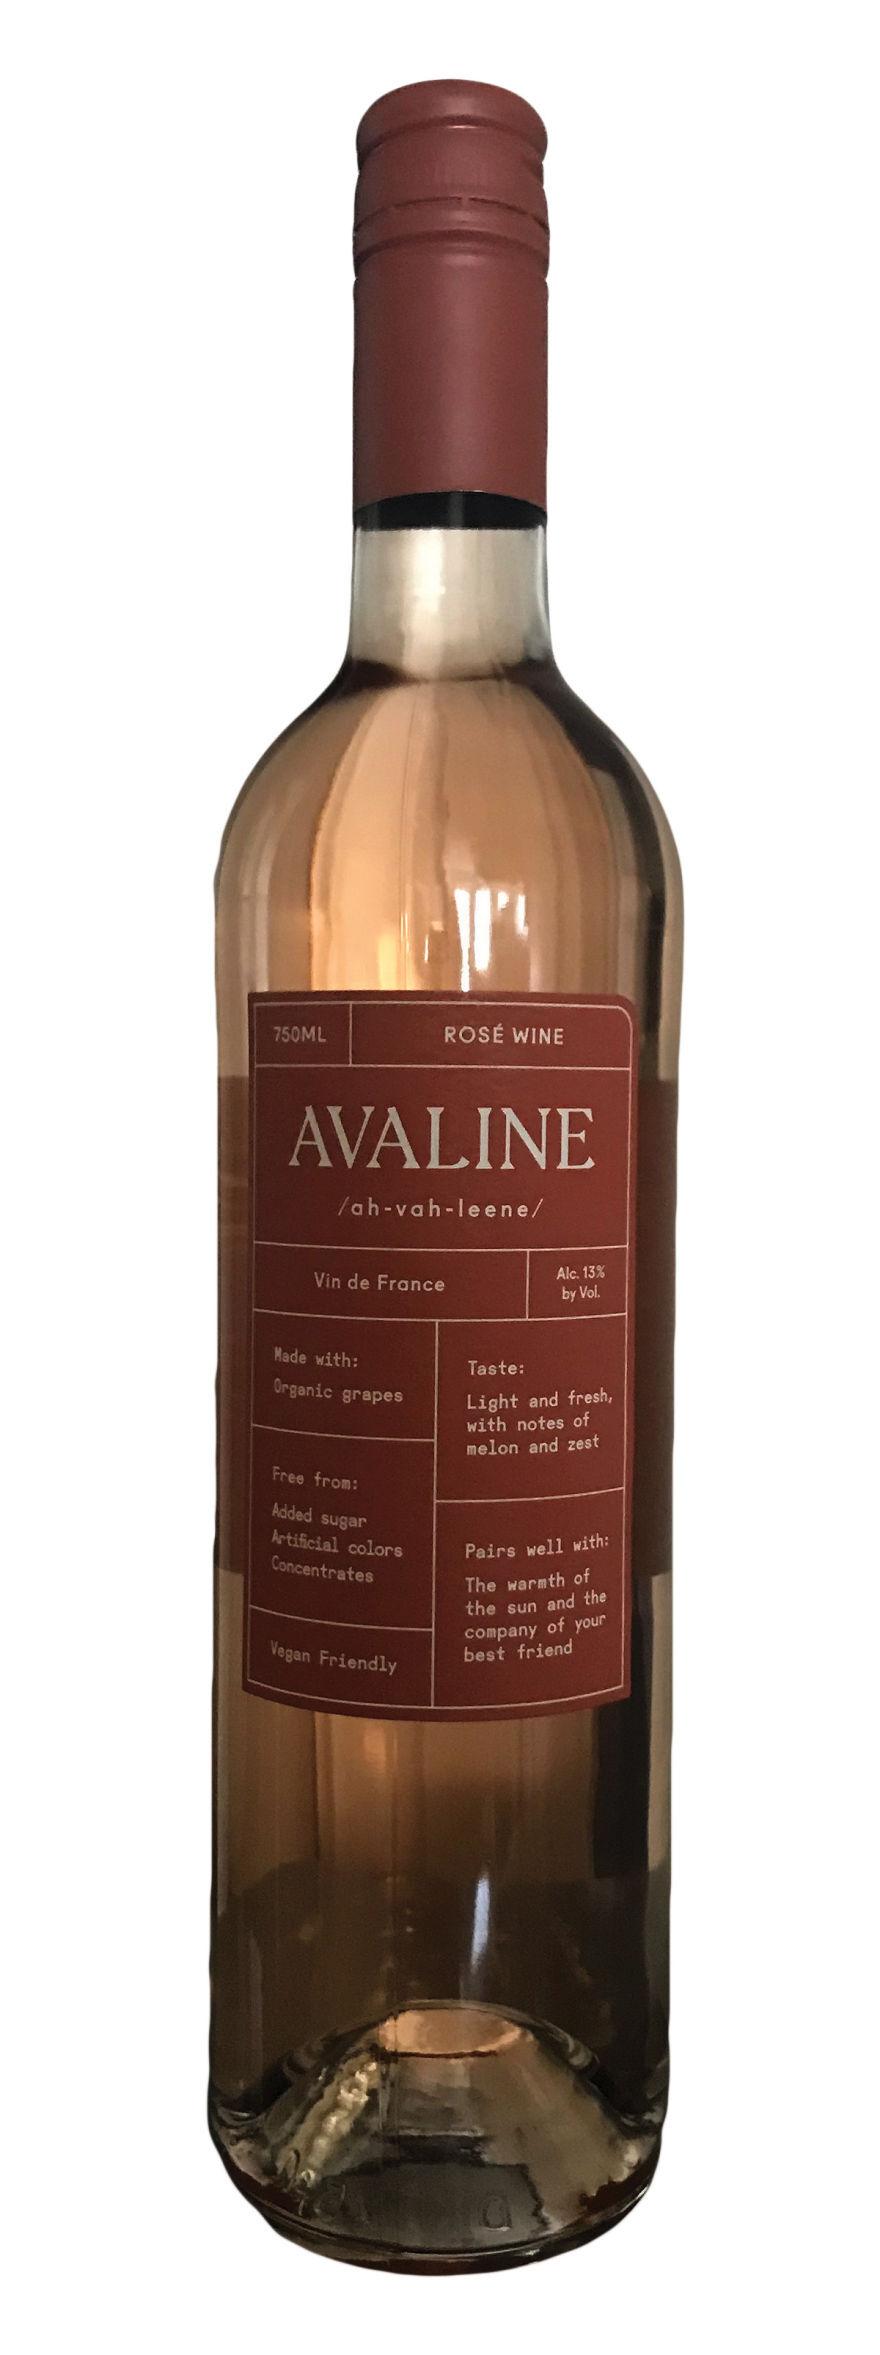 GE Avaline rose_1.jpg